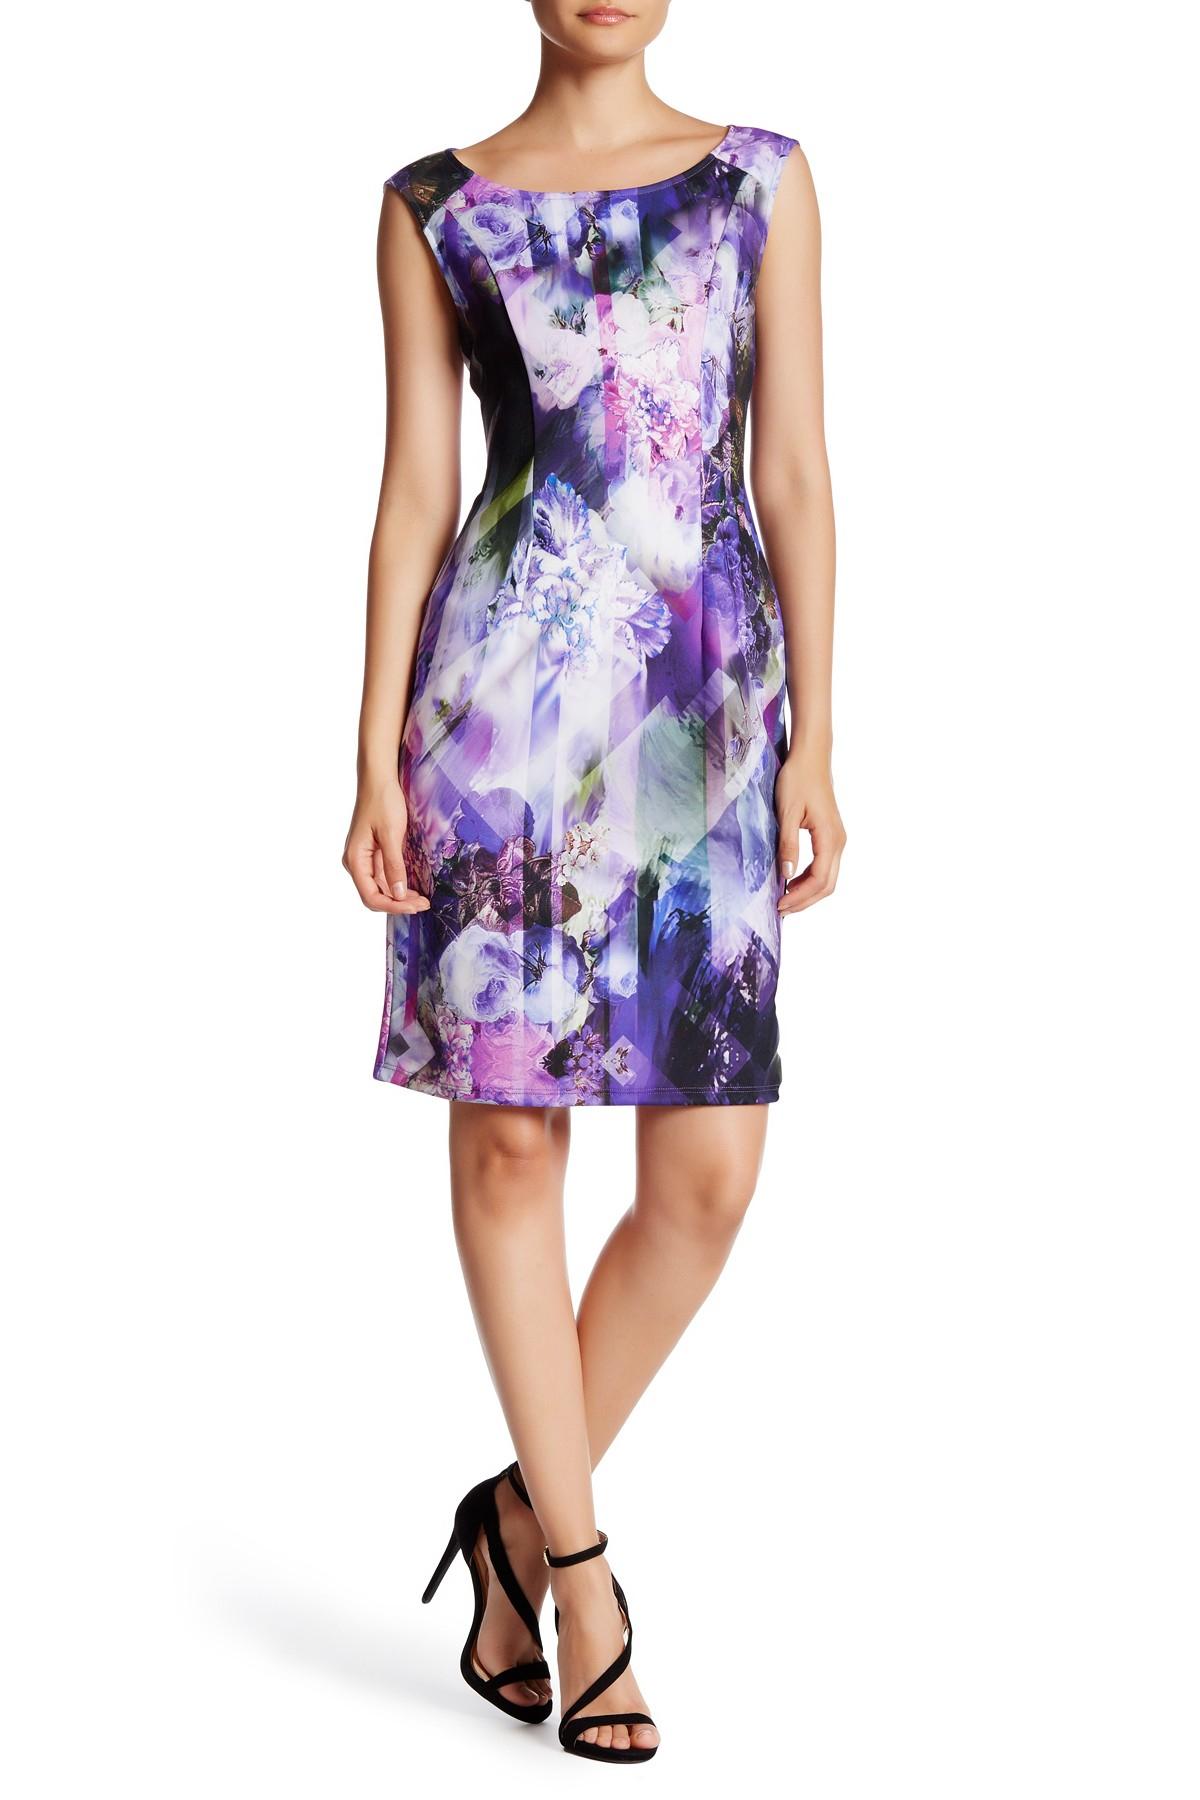 Lyst - Adrianna Papell Sleeveless Scuba Print Sheath Dress in Purple